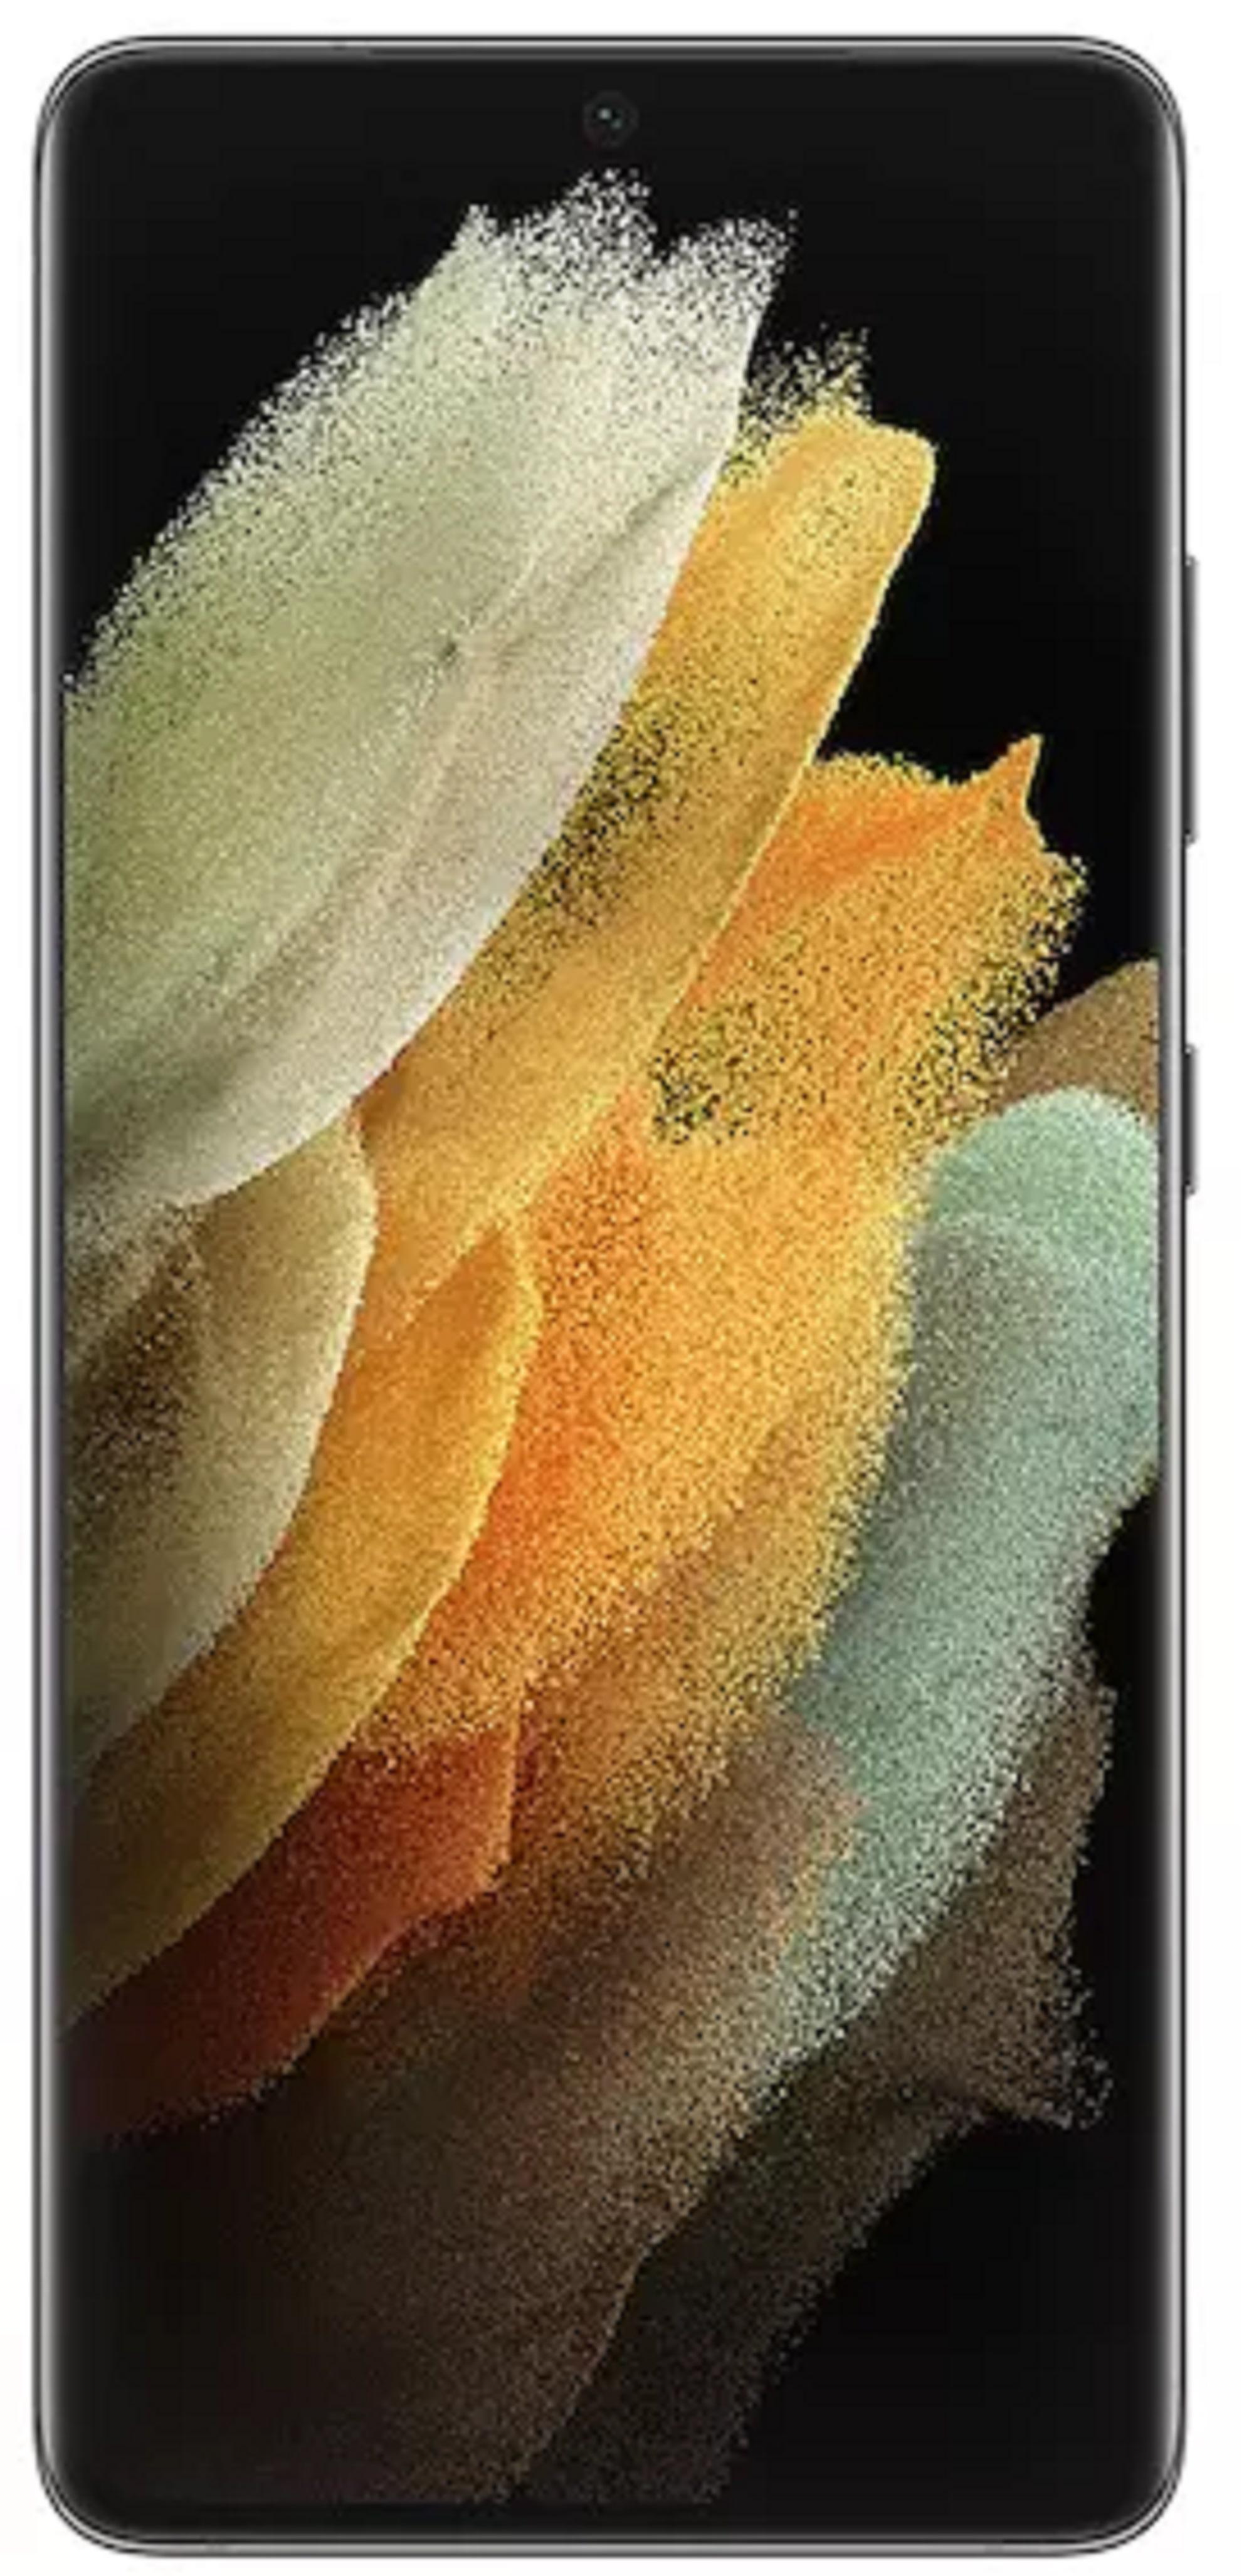 thumbnail 22 - Samsung Galaxy G998U S21 Ultra 5G 128GB Unlocked Smartphone - Excellent